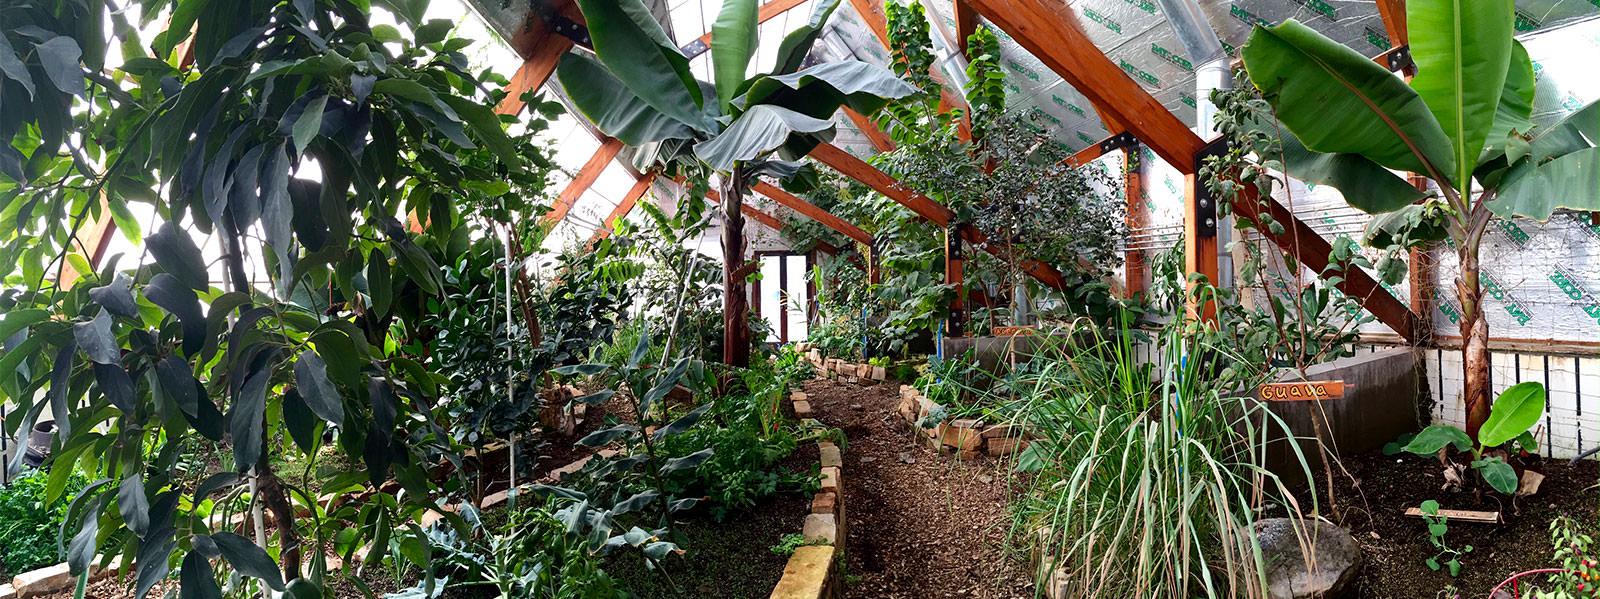 solar greenhouse design u0026 construction year round growing